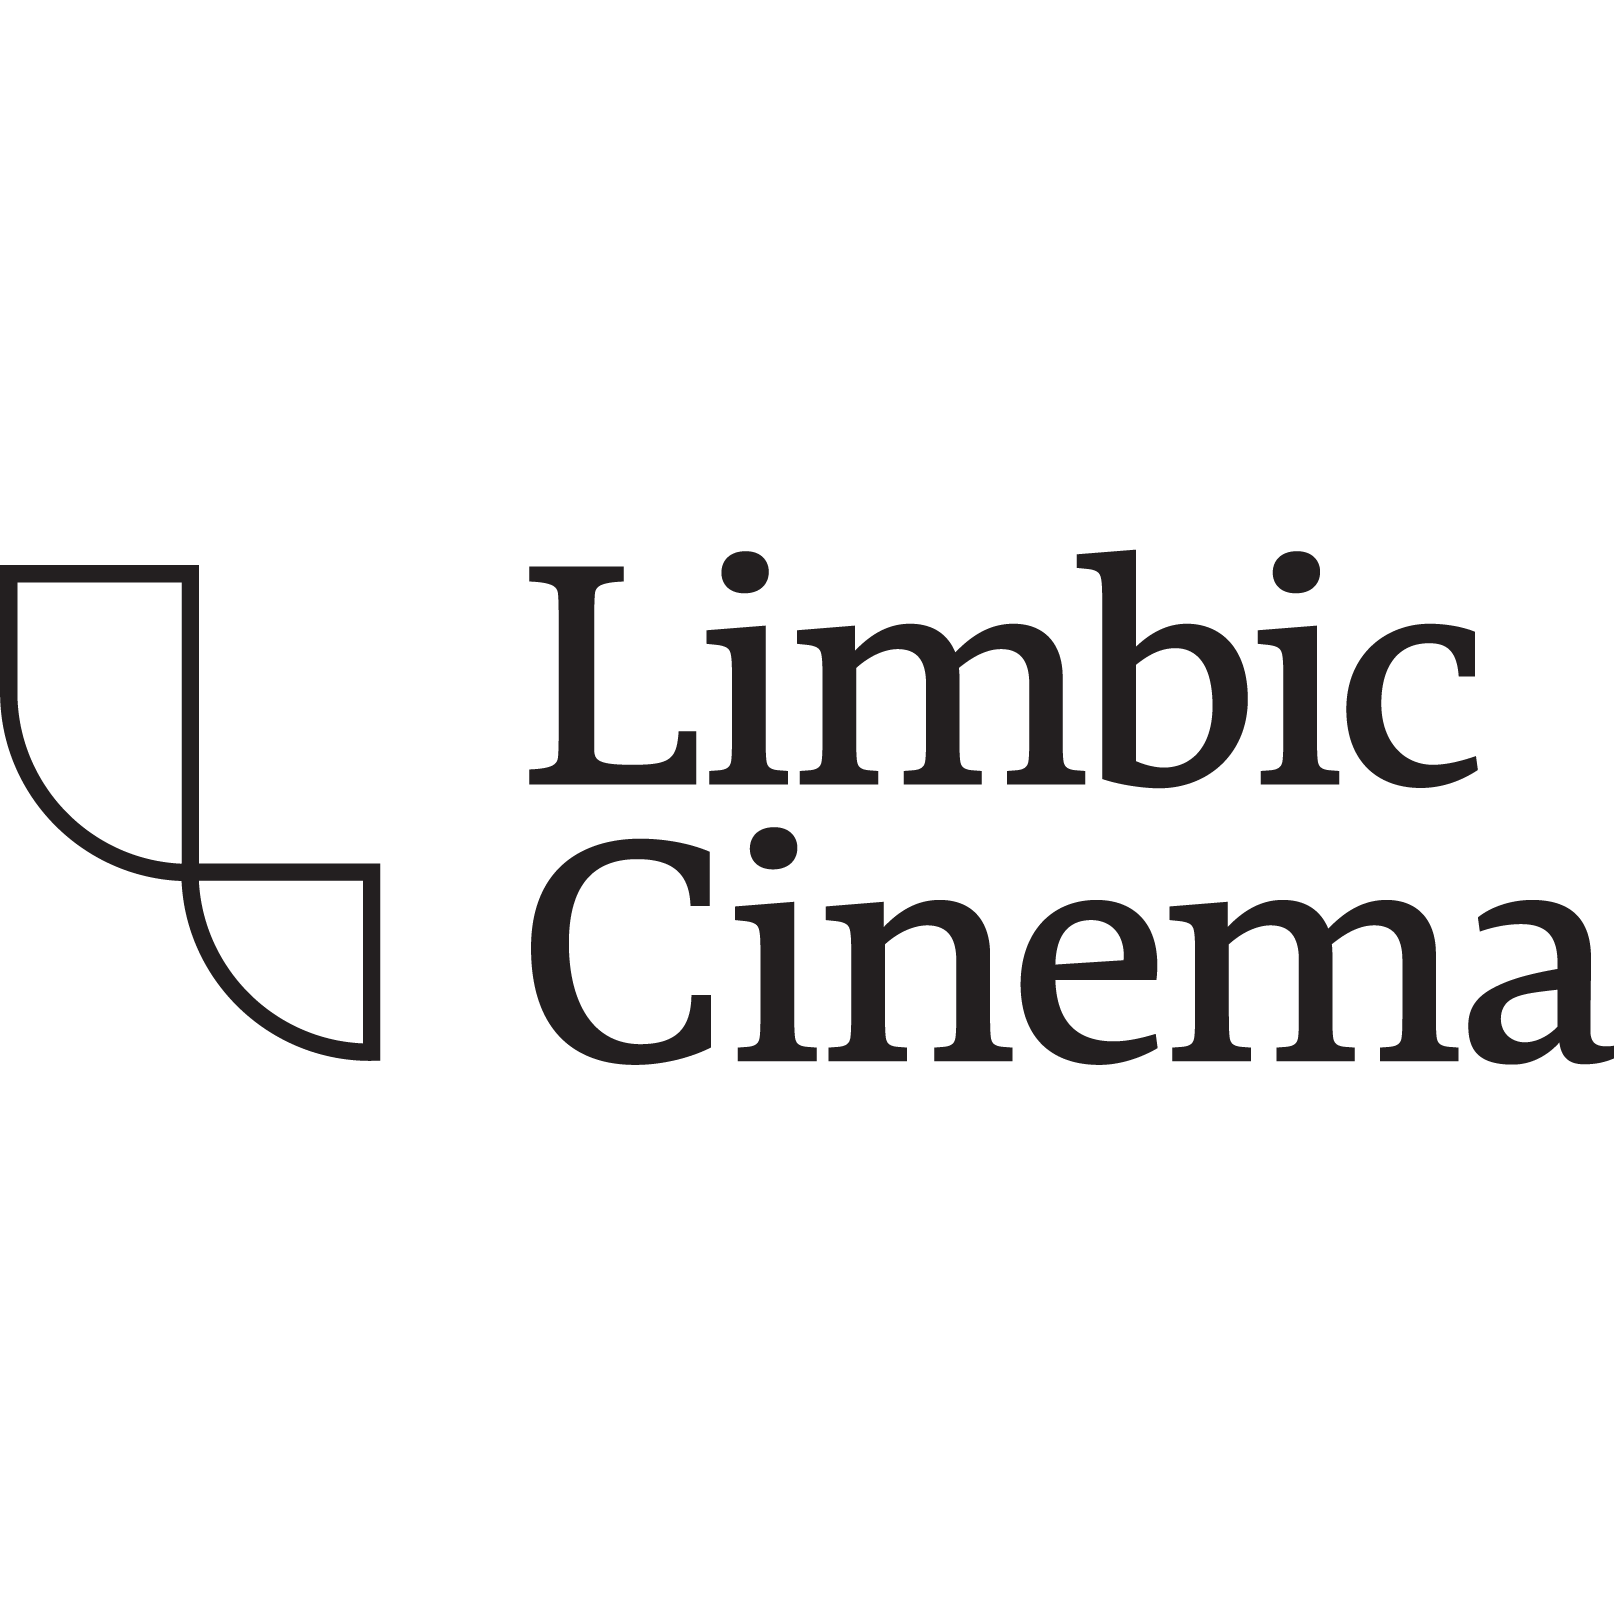 Limbic Cinema